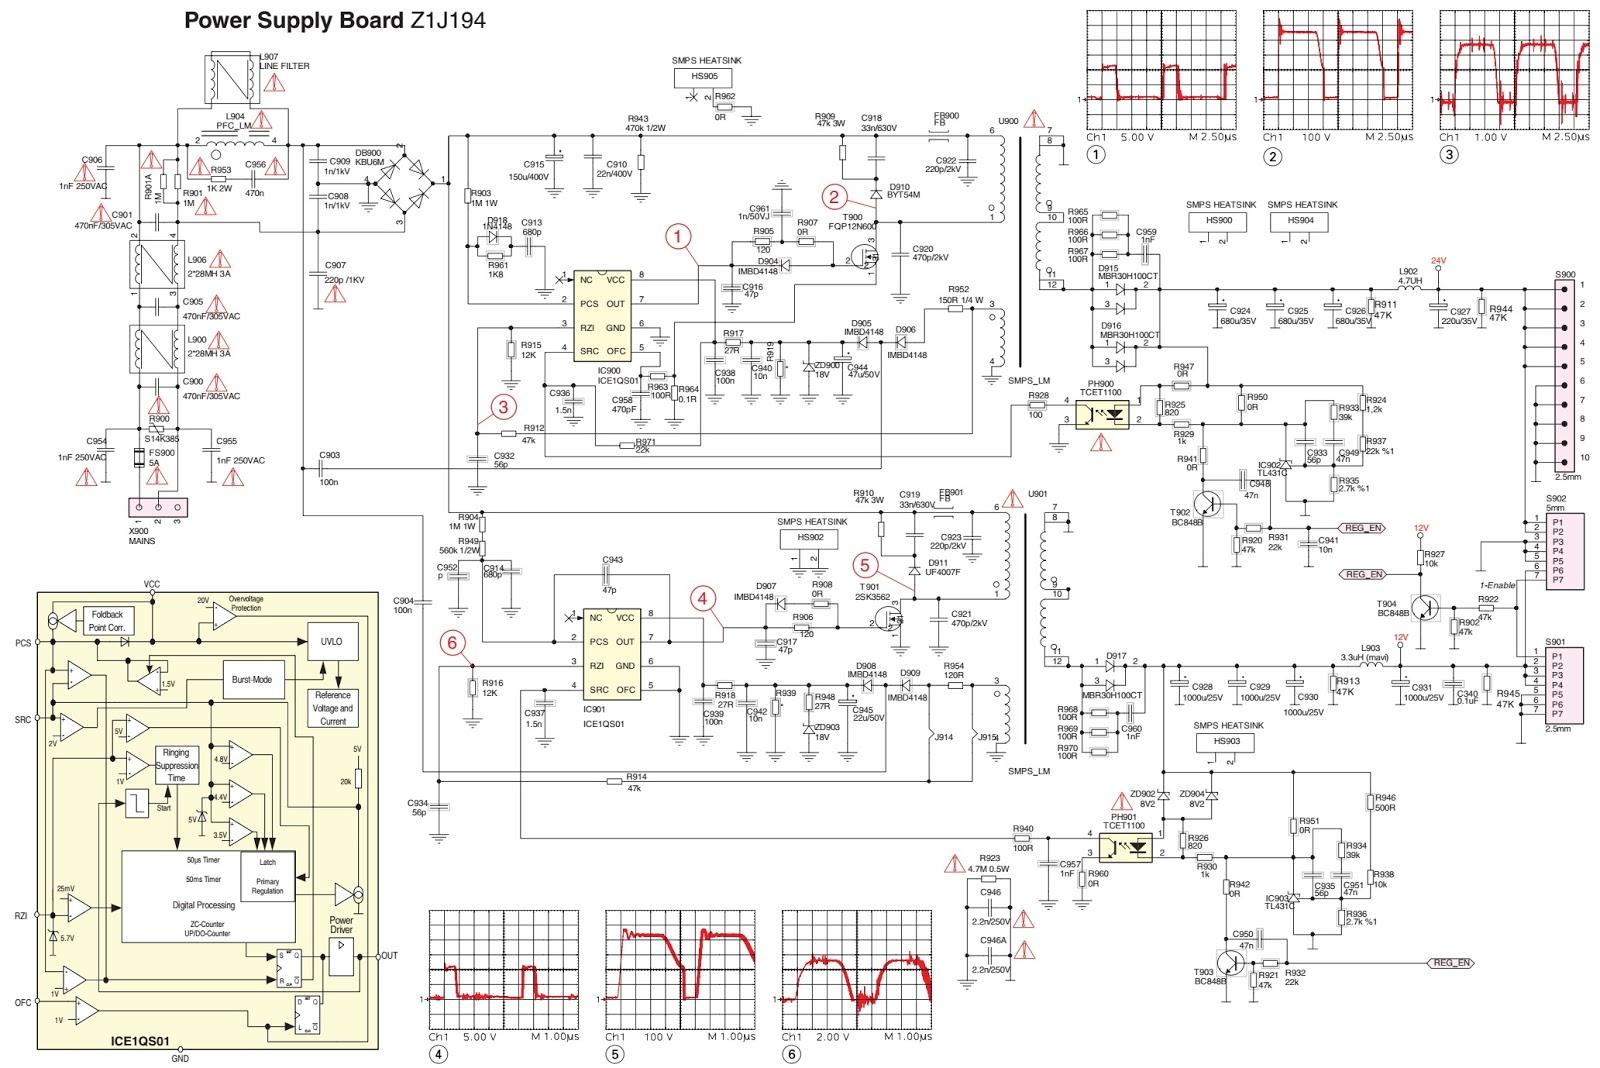 grundig and beko lcd tvs smps, inverter, scaler, audio output RTL2832 DVB-T USB-Stick dvb t circuit diagram